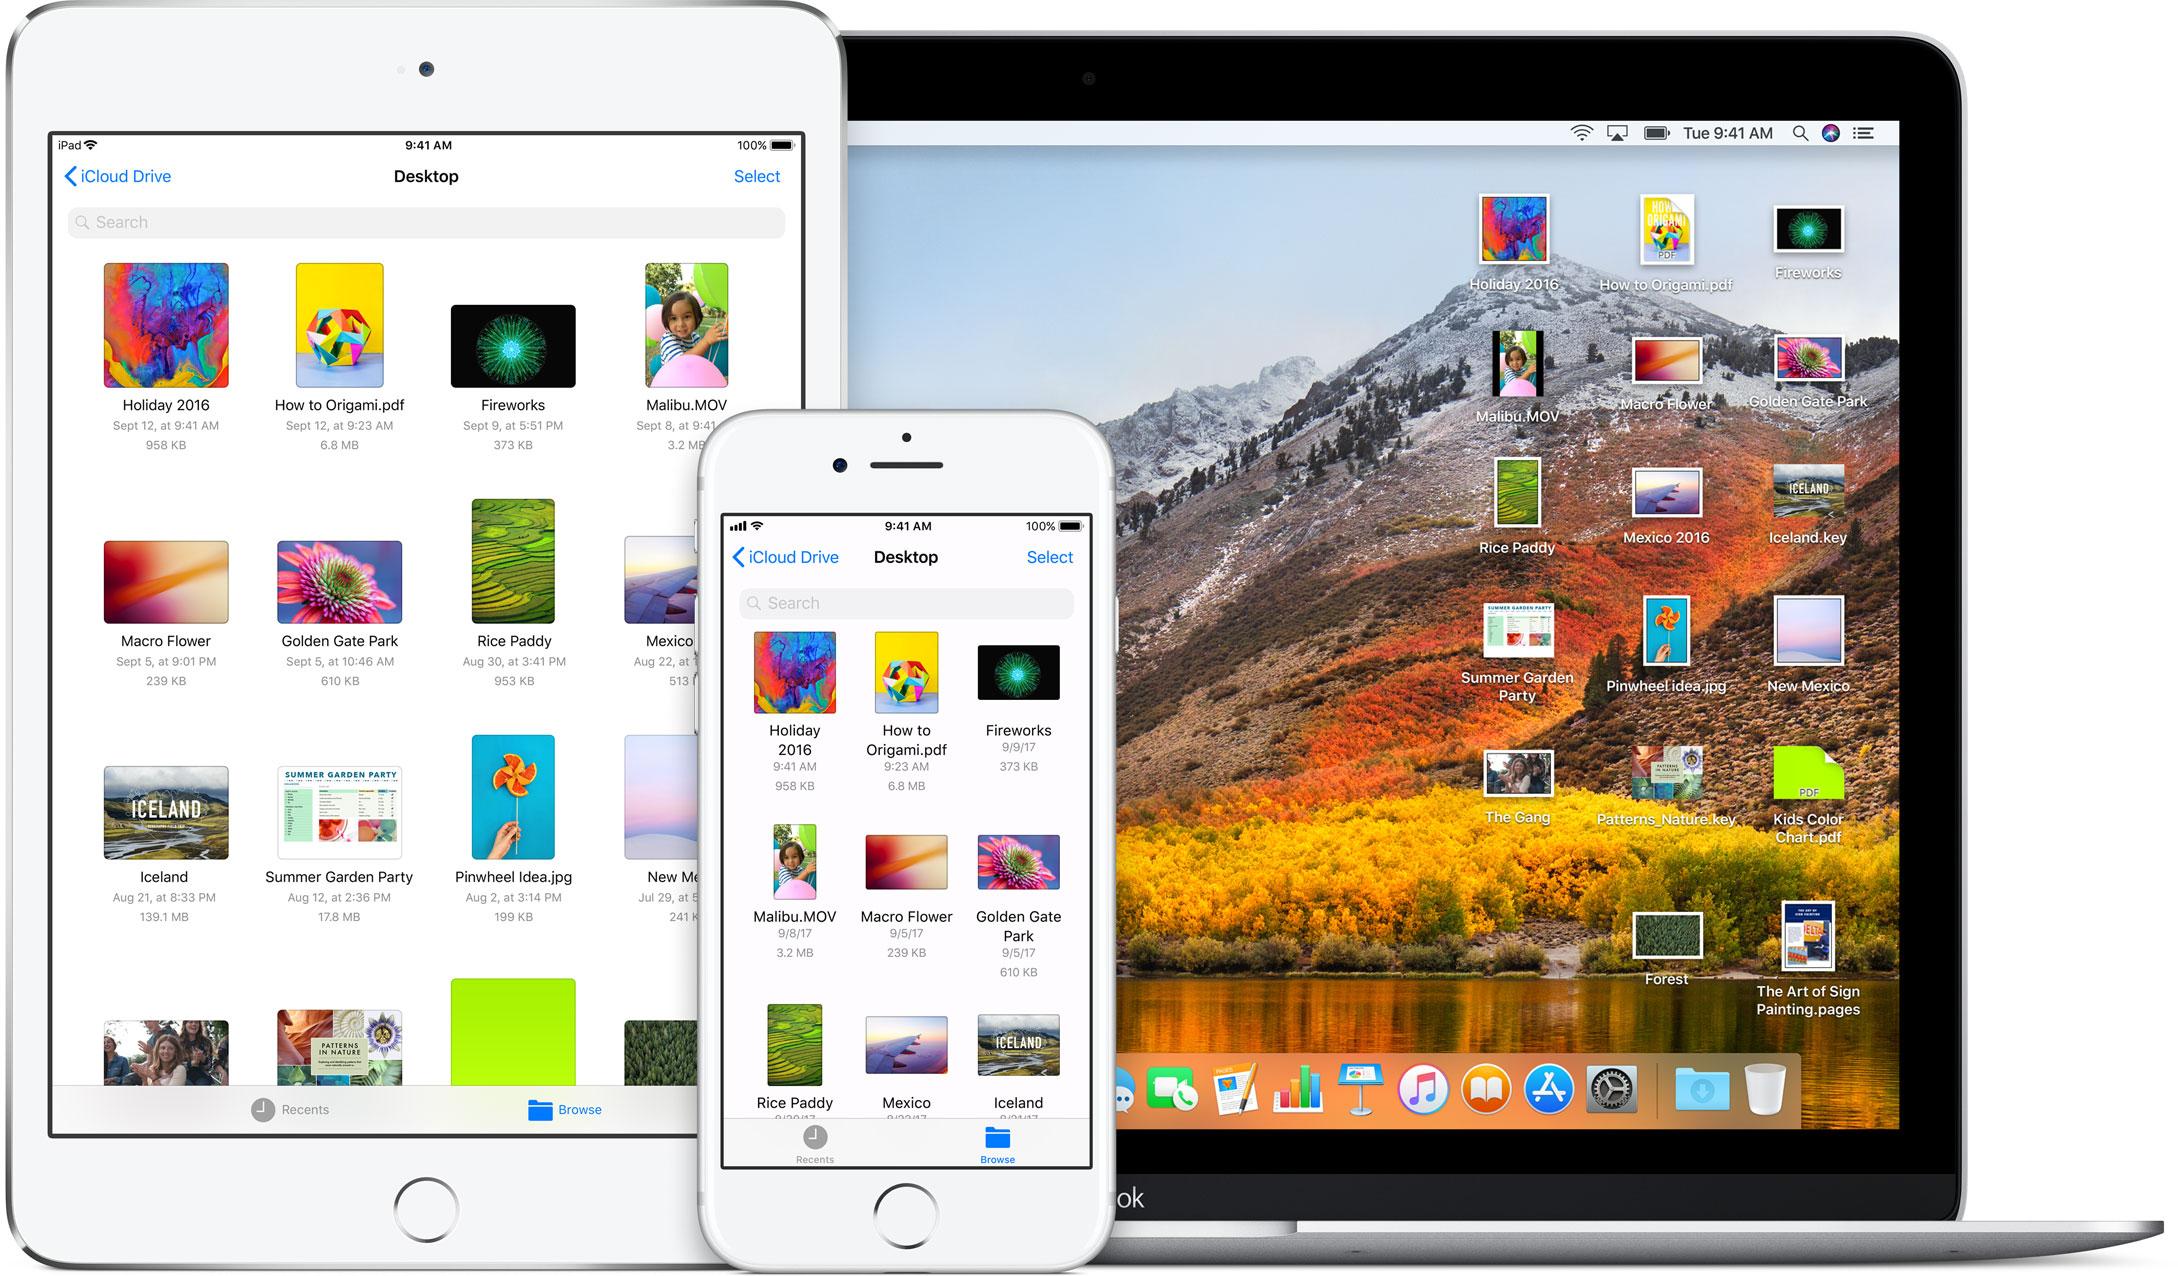 icloud drive ios 11 macos high sierra devices iphone ipad macbook - Novinky za uplynulý týždeň: update pre iOS, detaily o HomePode, nové iPhony a ďalšie...